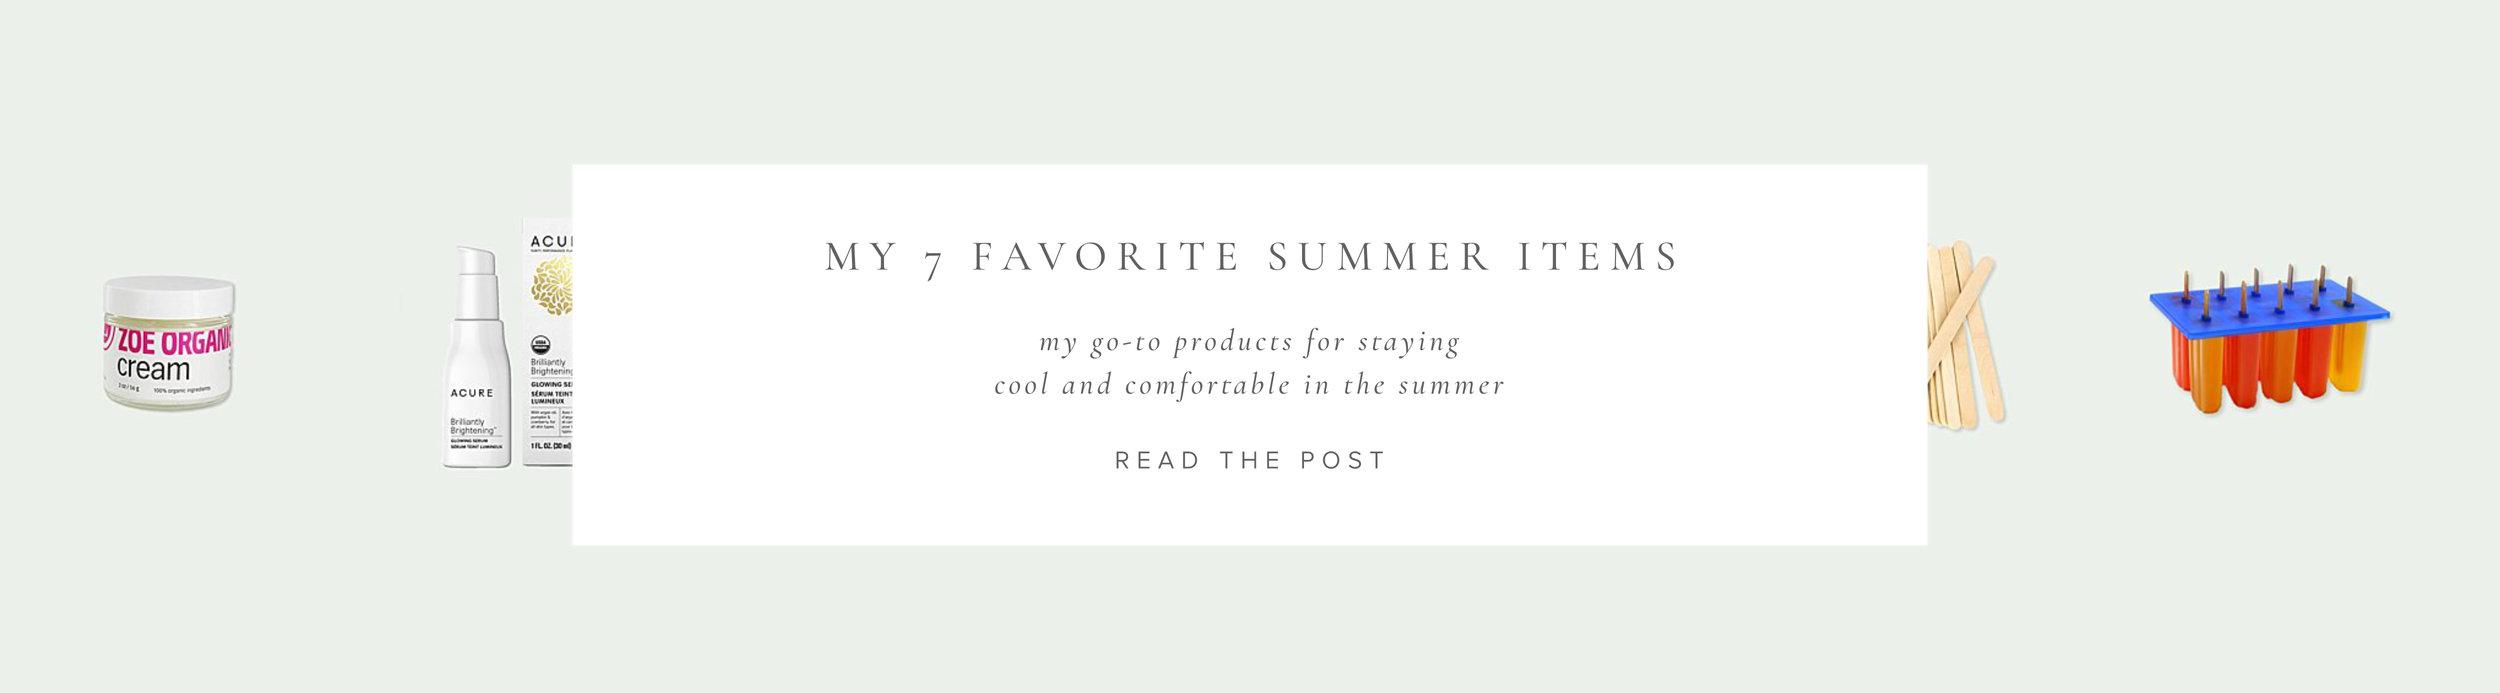 My 7 Favorite Summer Items   Aiane Karla   www.aianekarla.com